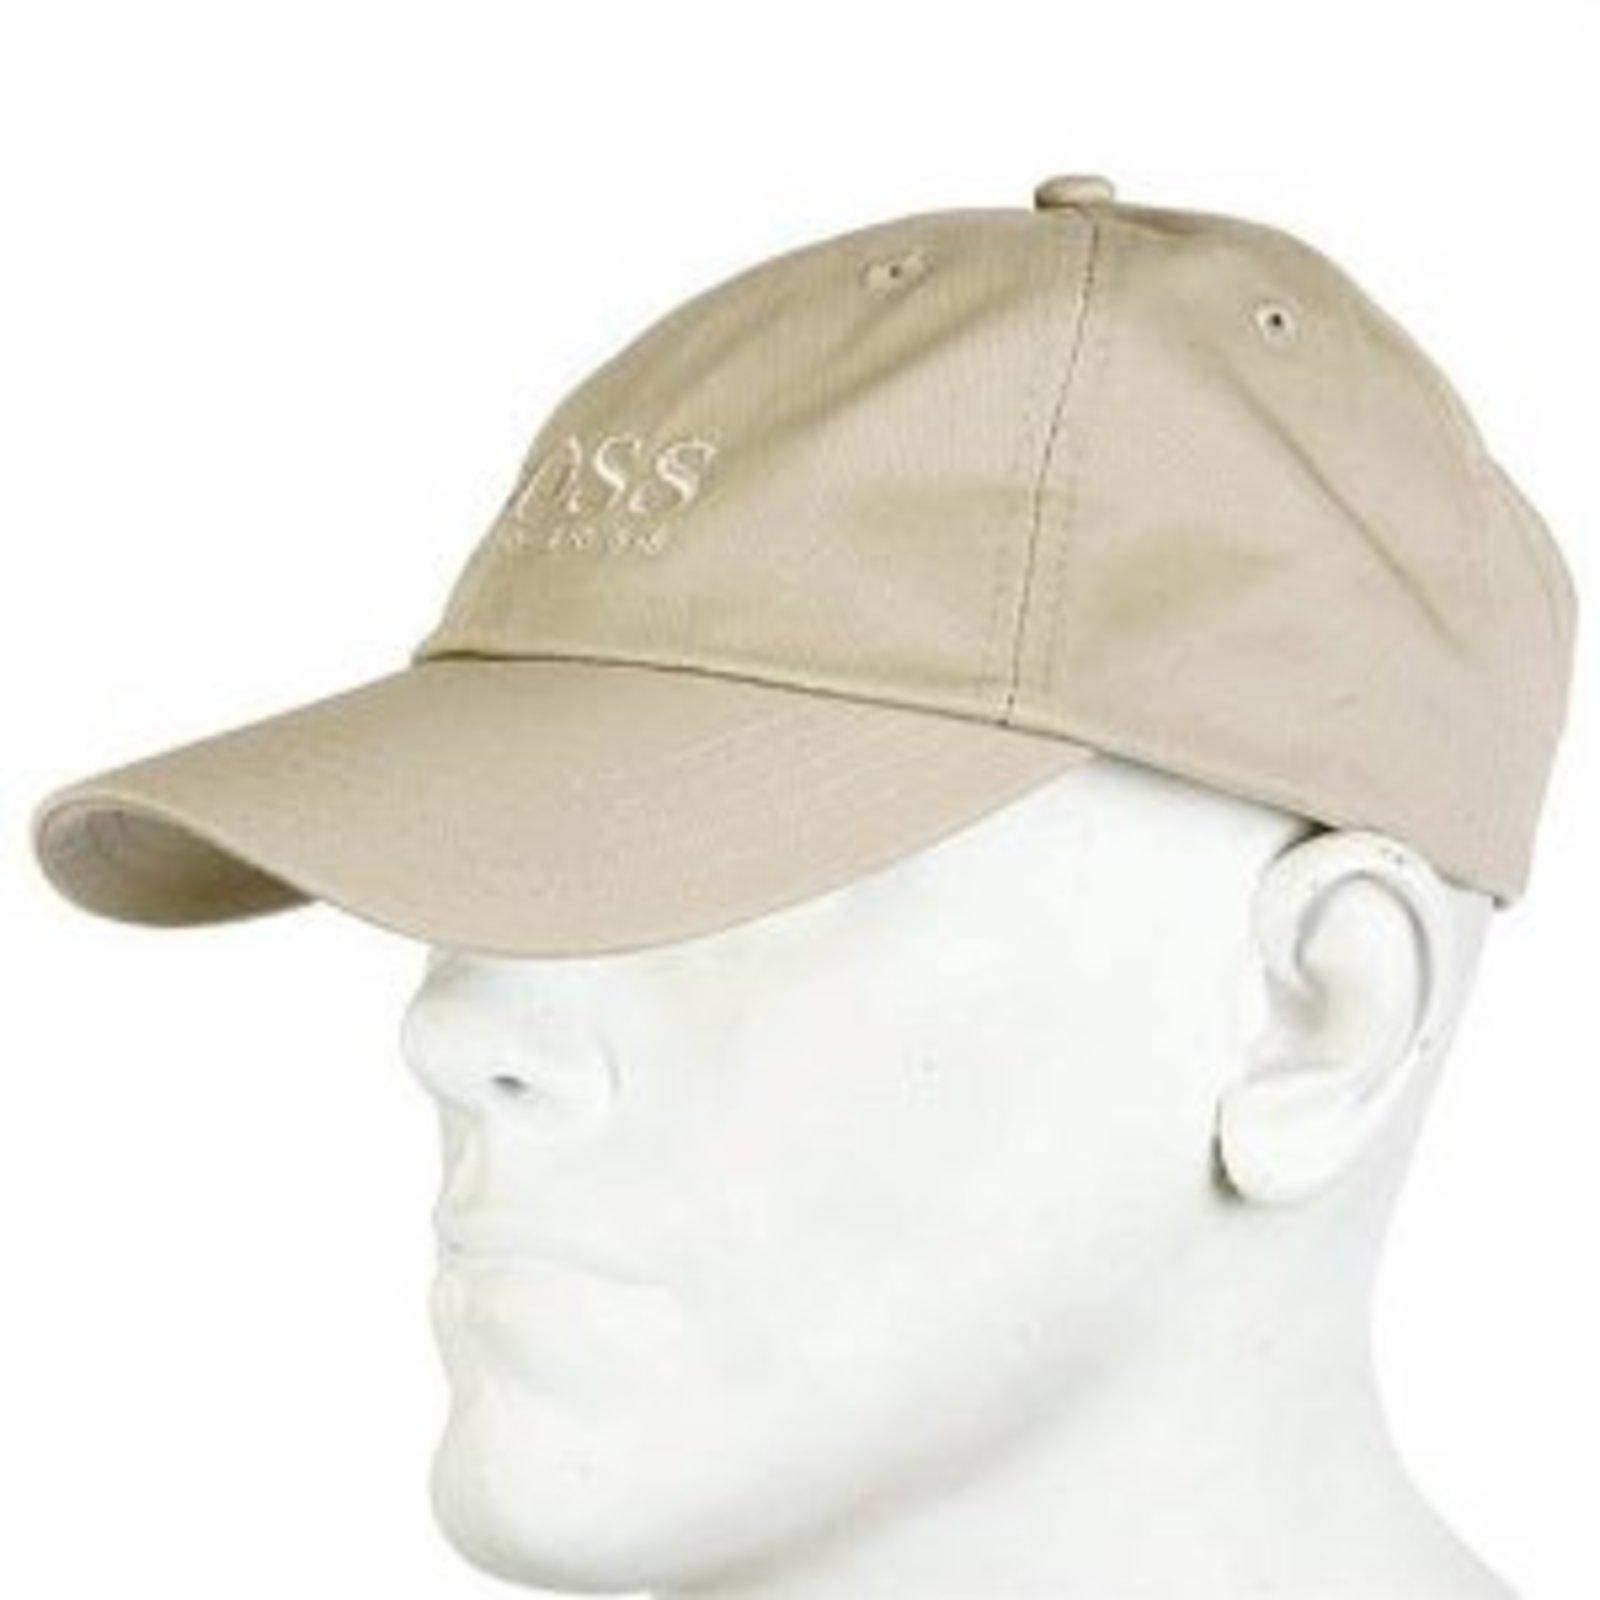 f84c666132c Hugo Boss cap BOSS2884 at Togged Clothing